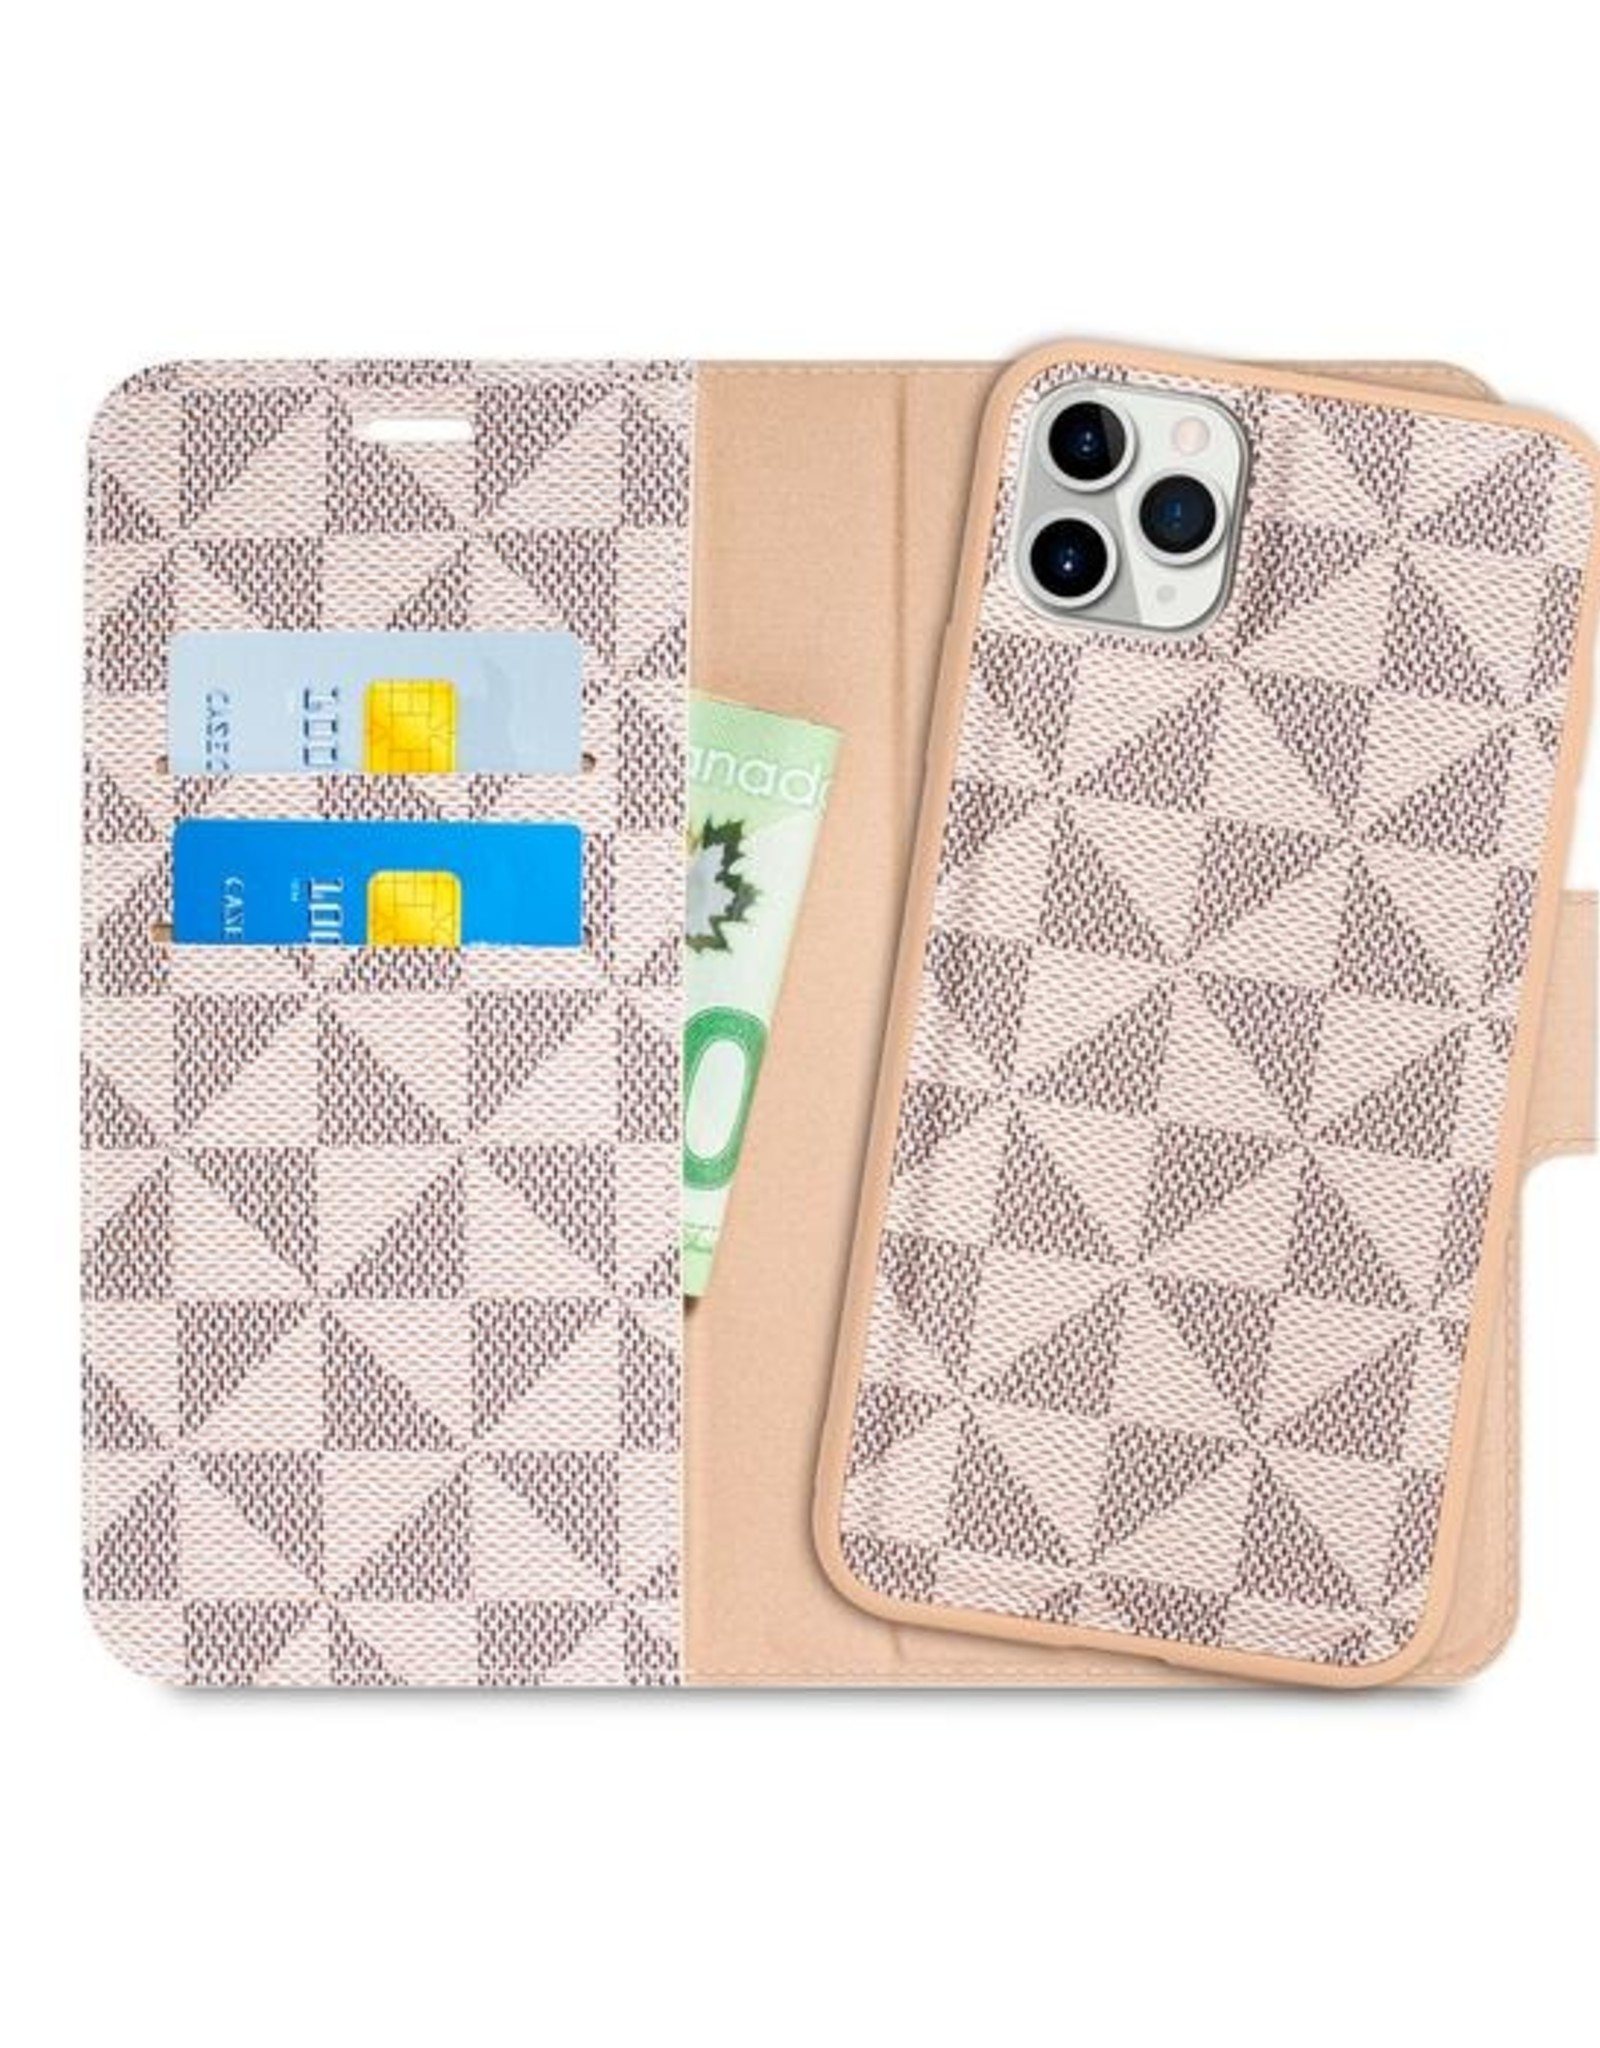 Caseco Caseco | Park Ave Detachable RFID Protection Folio Case - iPhone 11 Pro Max C3309-20